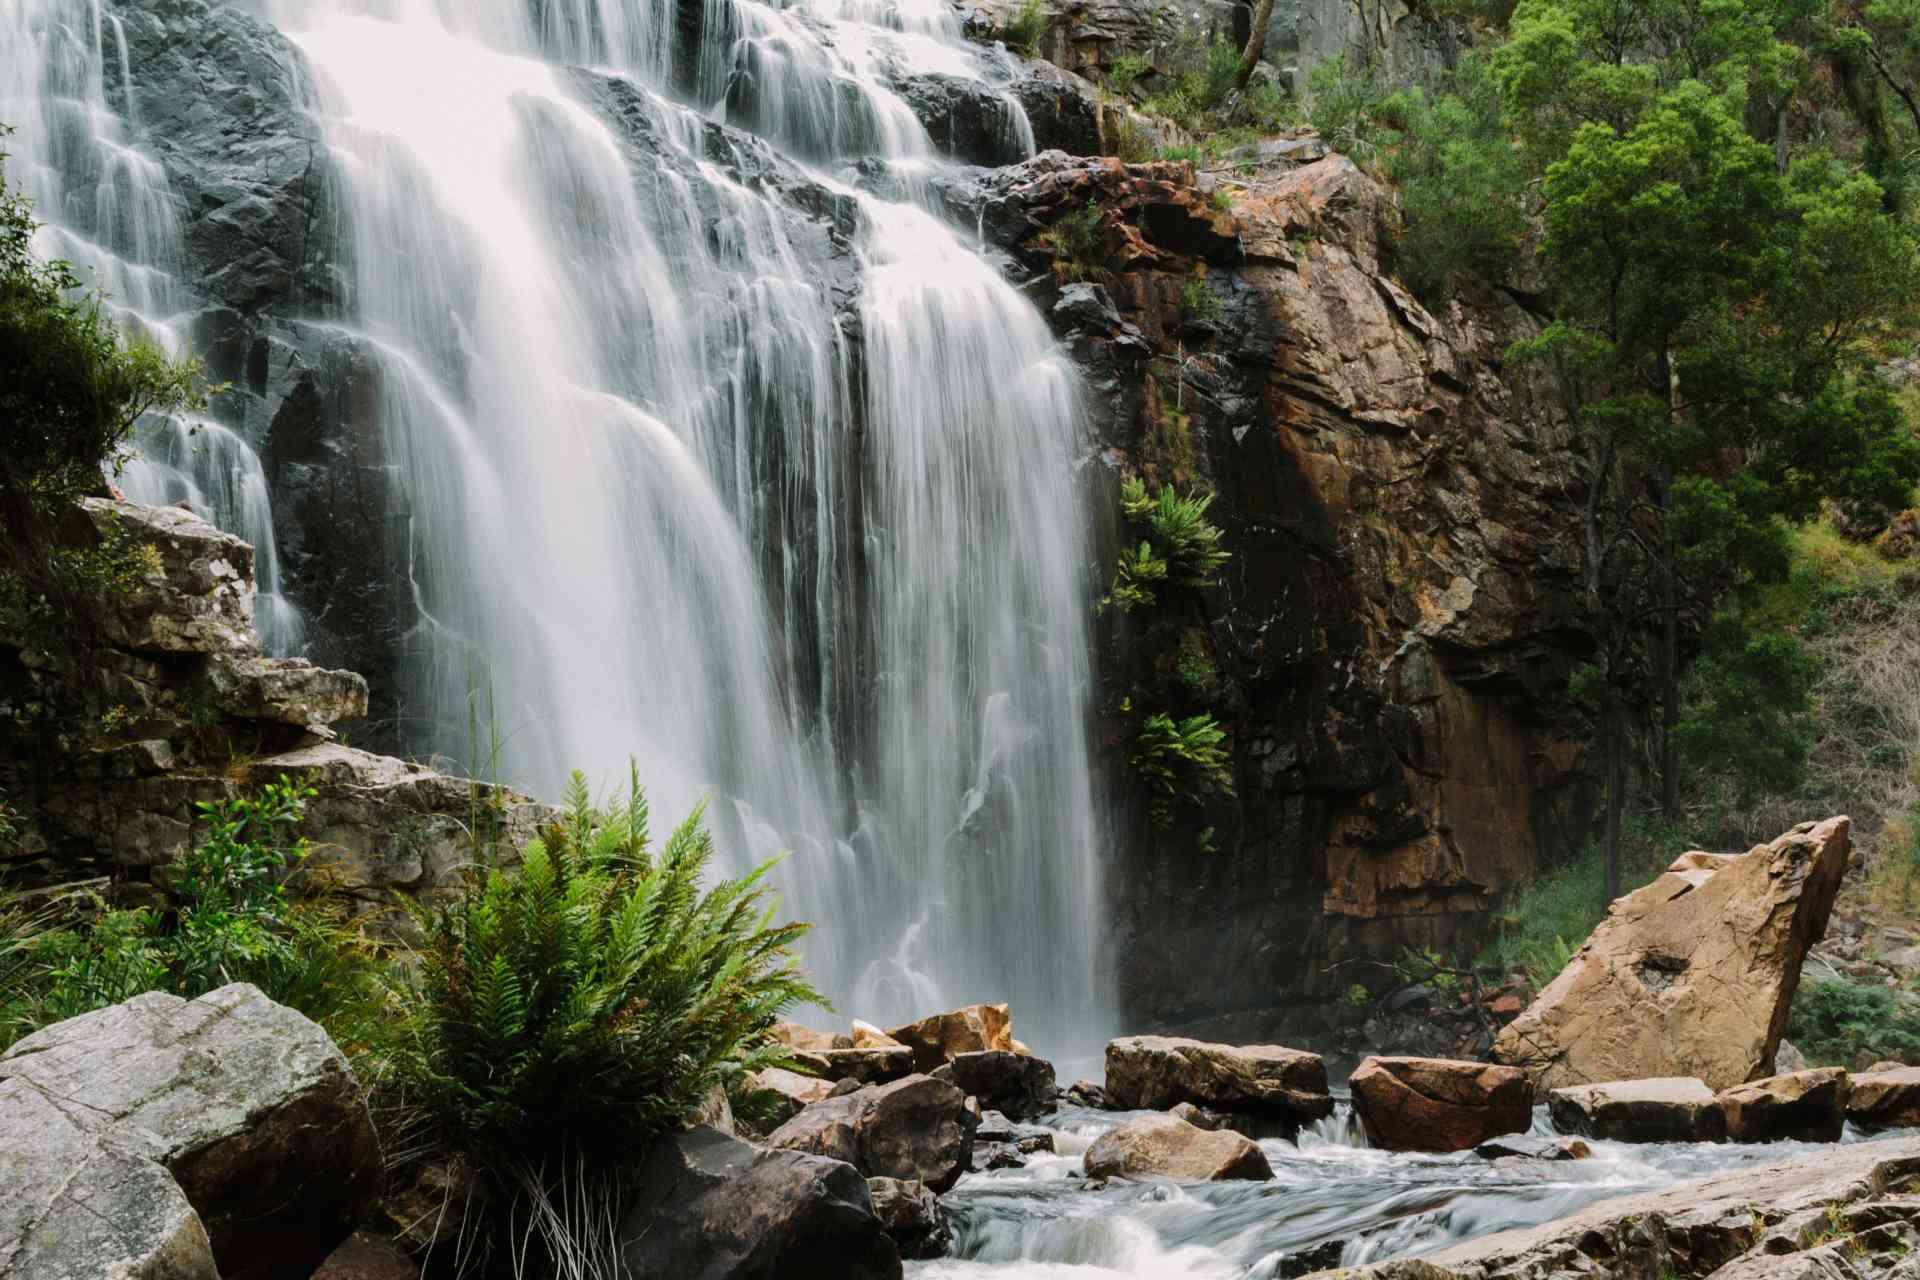 MacKenzie Falls, Grampians National Park, Victoria by Visit Victoria